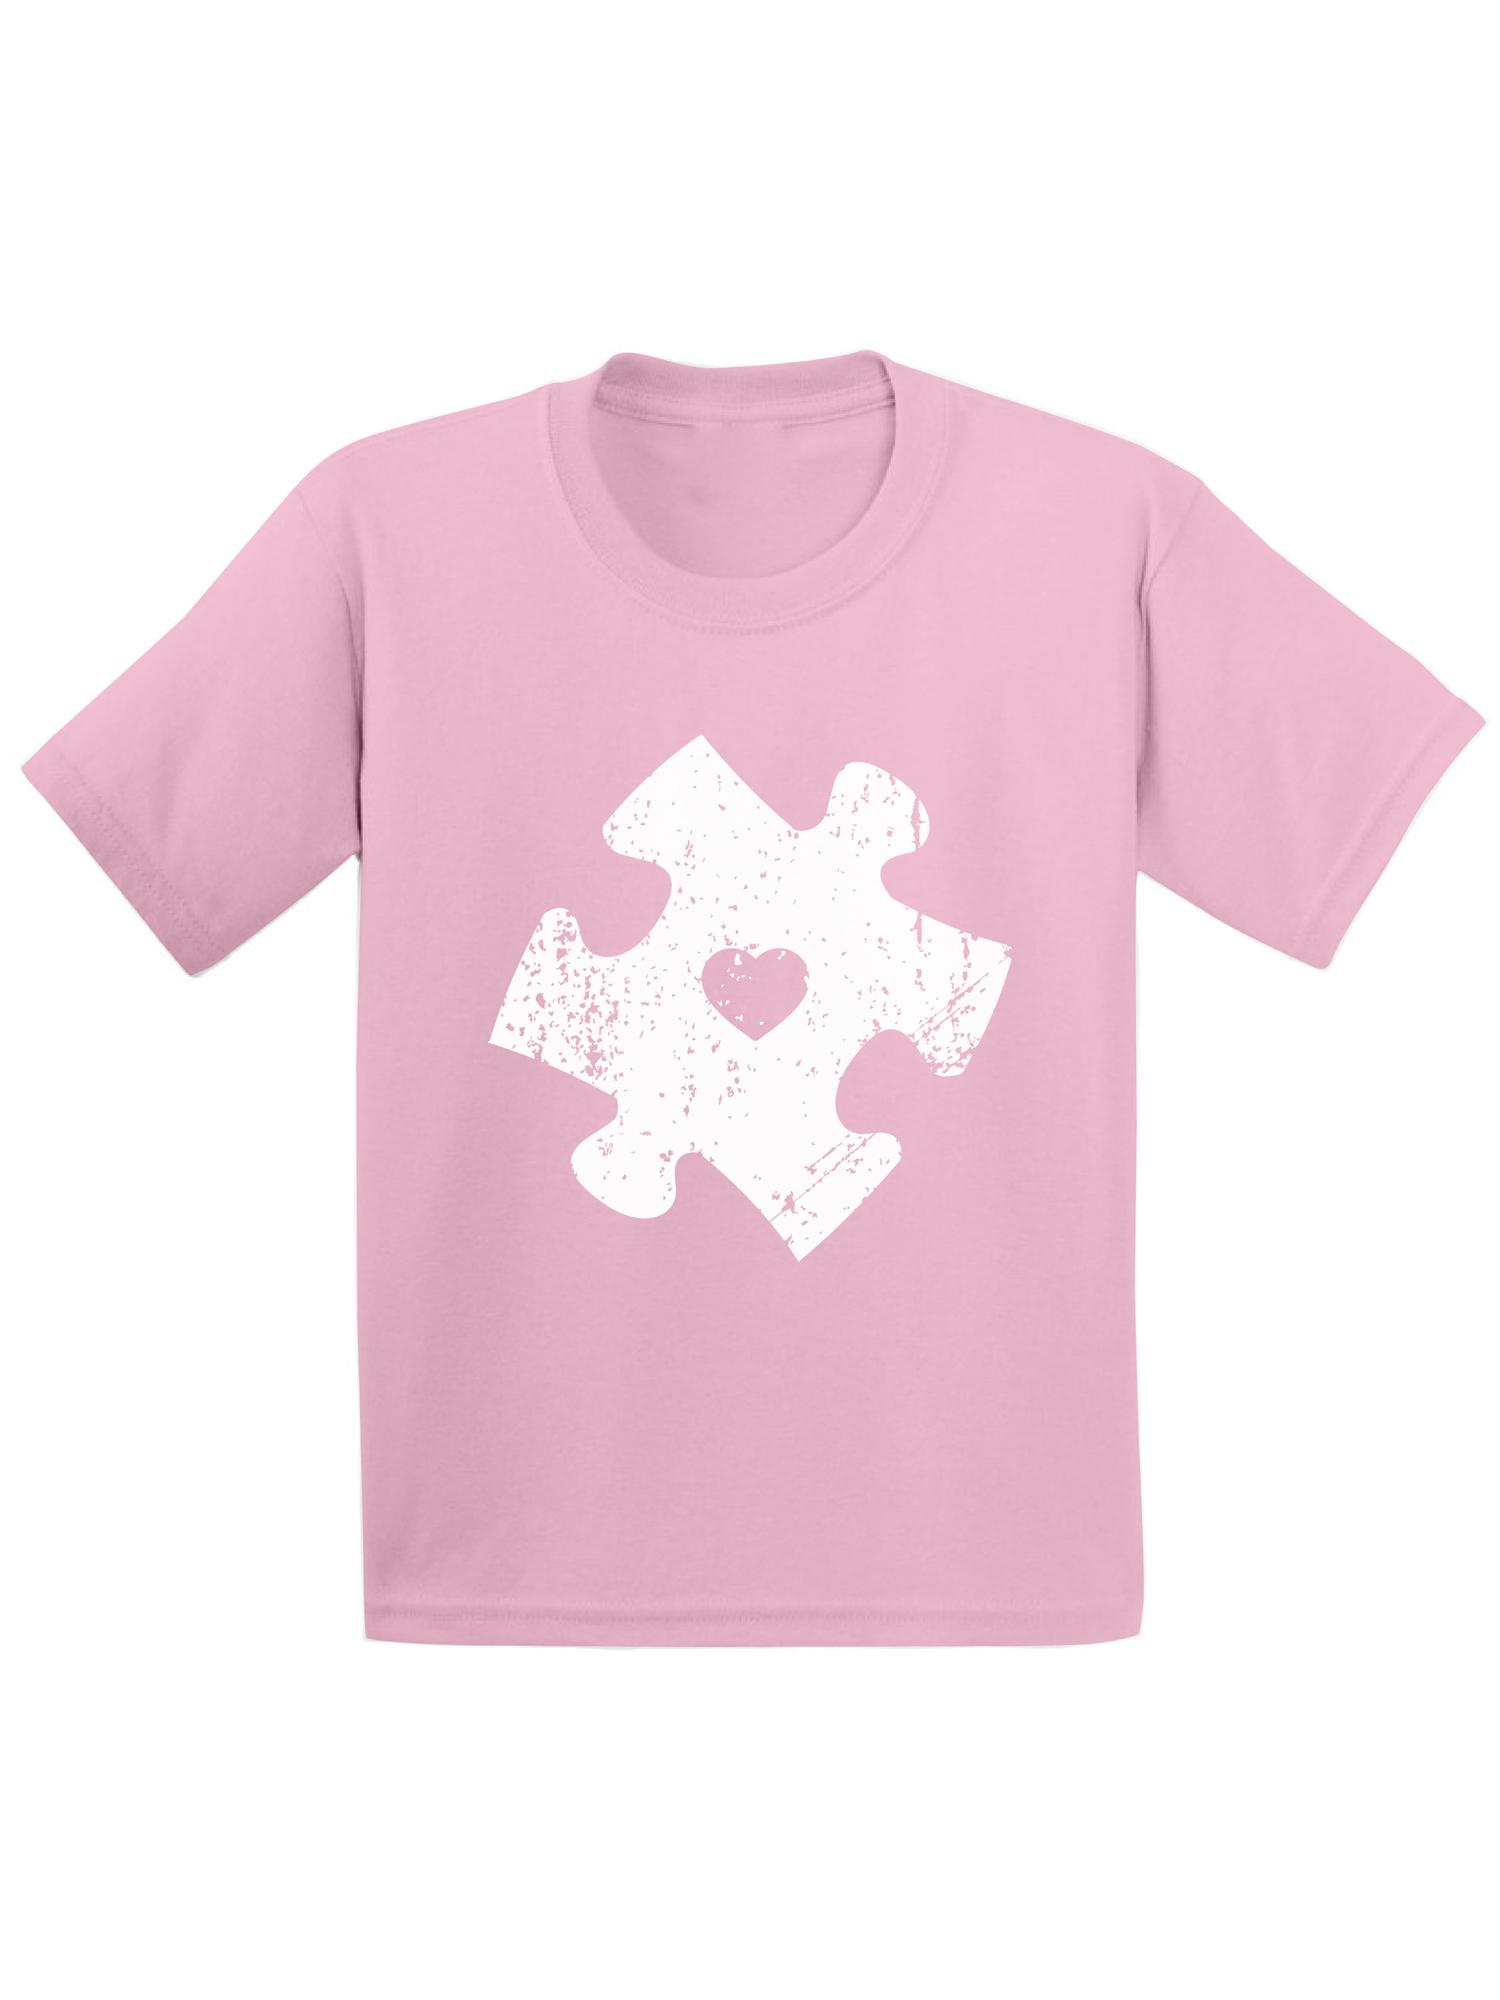 Awkward Styles Puzzle Toddler Shirt Autism Awareness Shirts for Kids Autism Puzzle Tshirt Autism Awareness Gifts for Boys and Girls Autism Puzzle Toddler T Shirt Autism Puzzle Kids Shirt